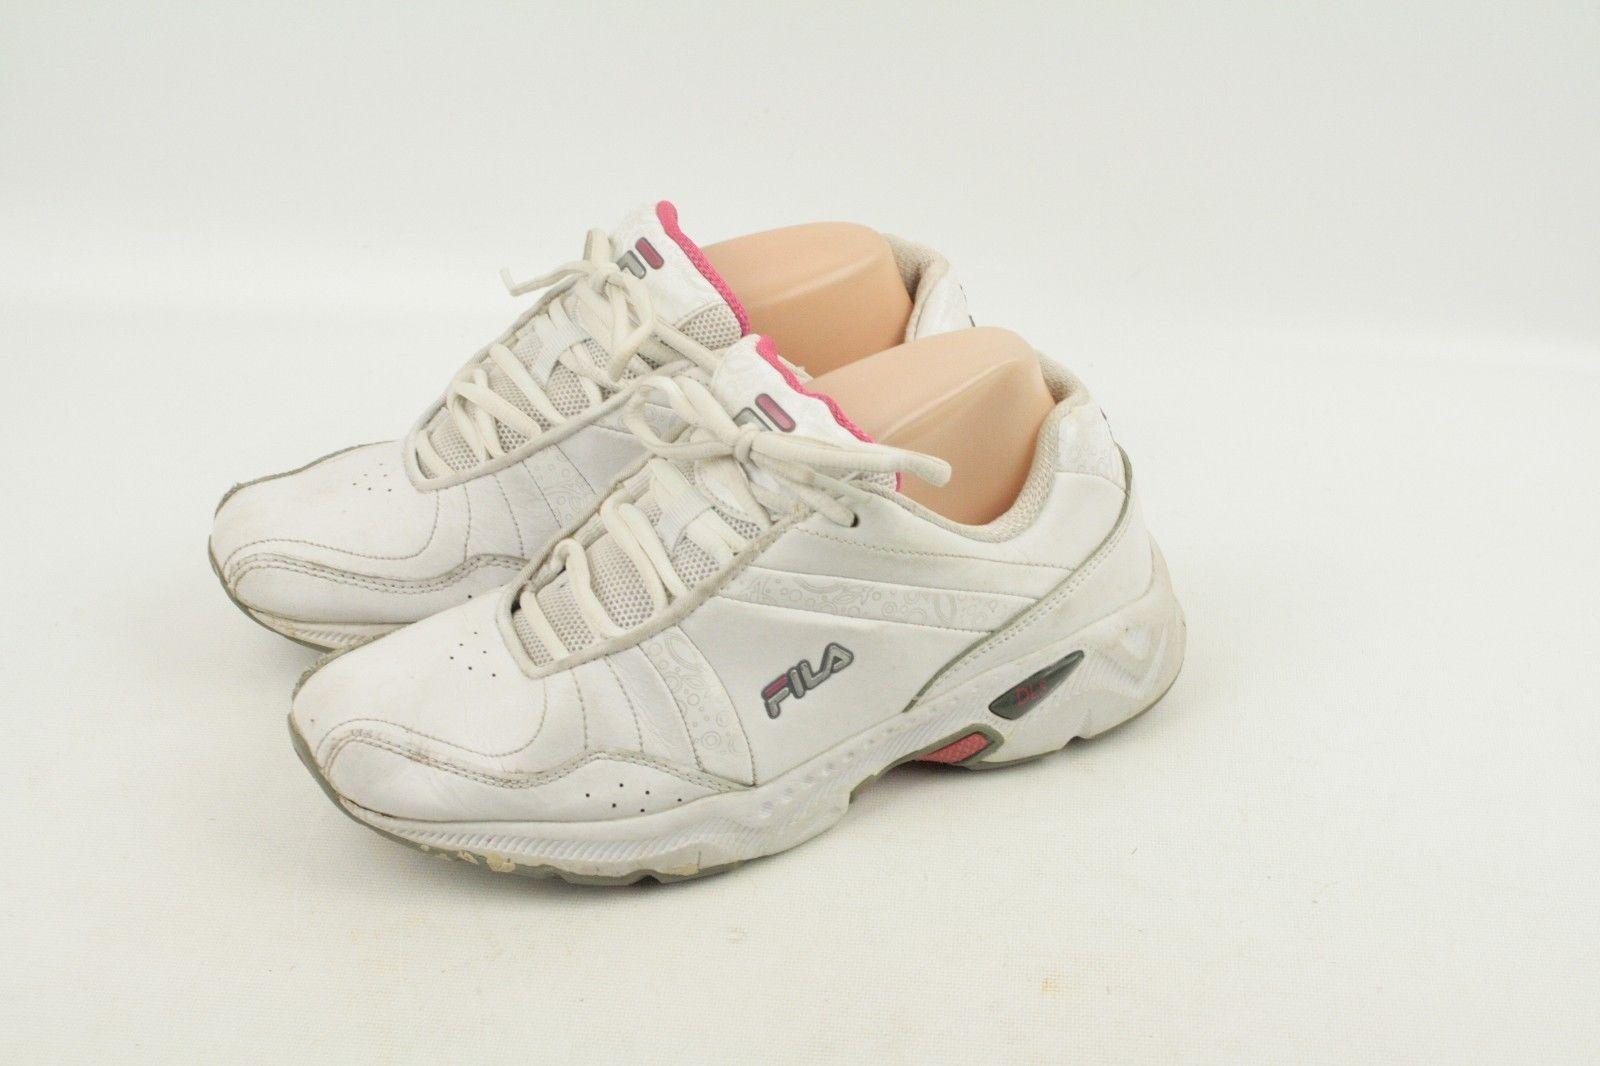 90a1b00285c8 FILA-Womens-Memory-Foam-Outreach-Athletic-Shoe and 50 similar items. 57